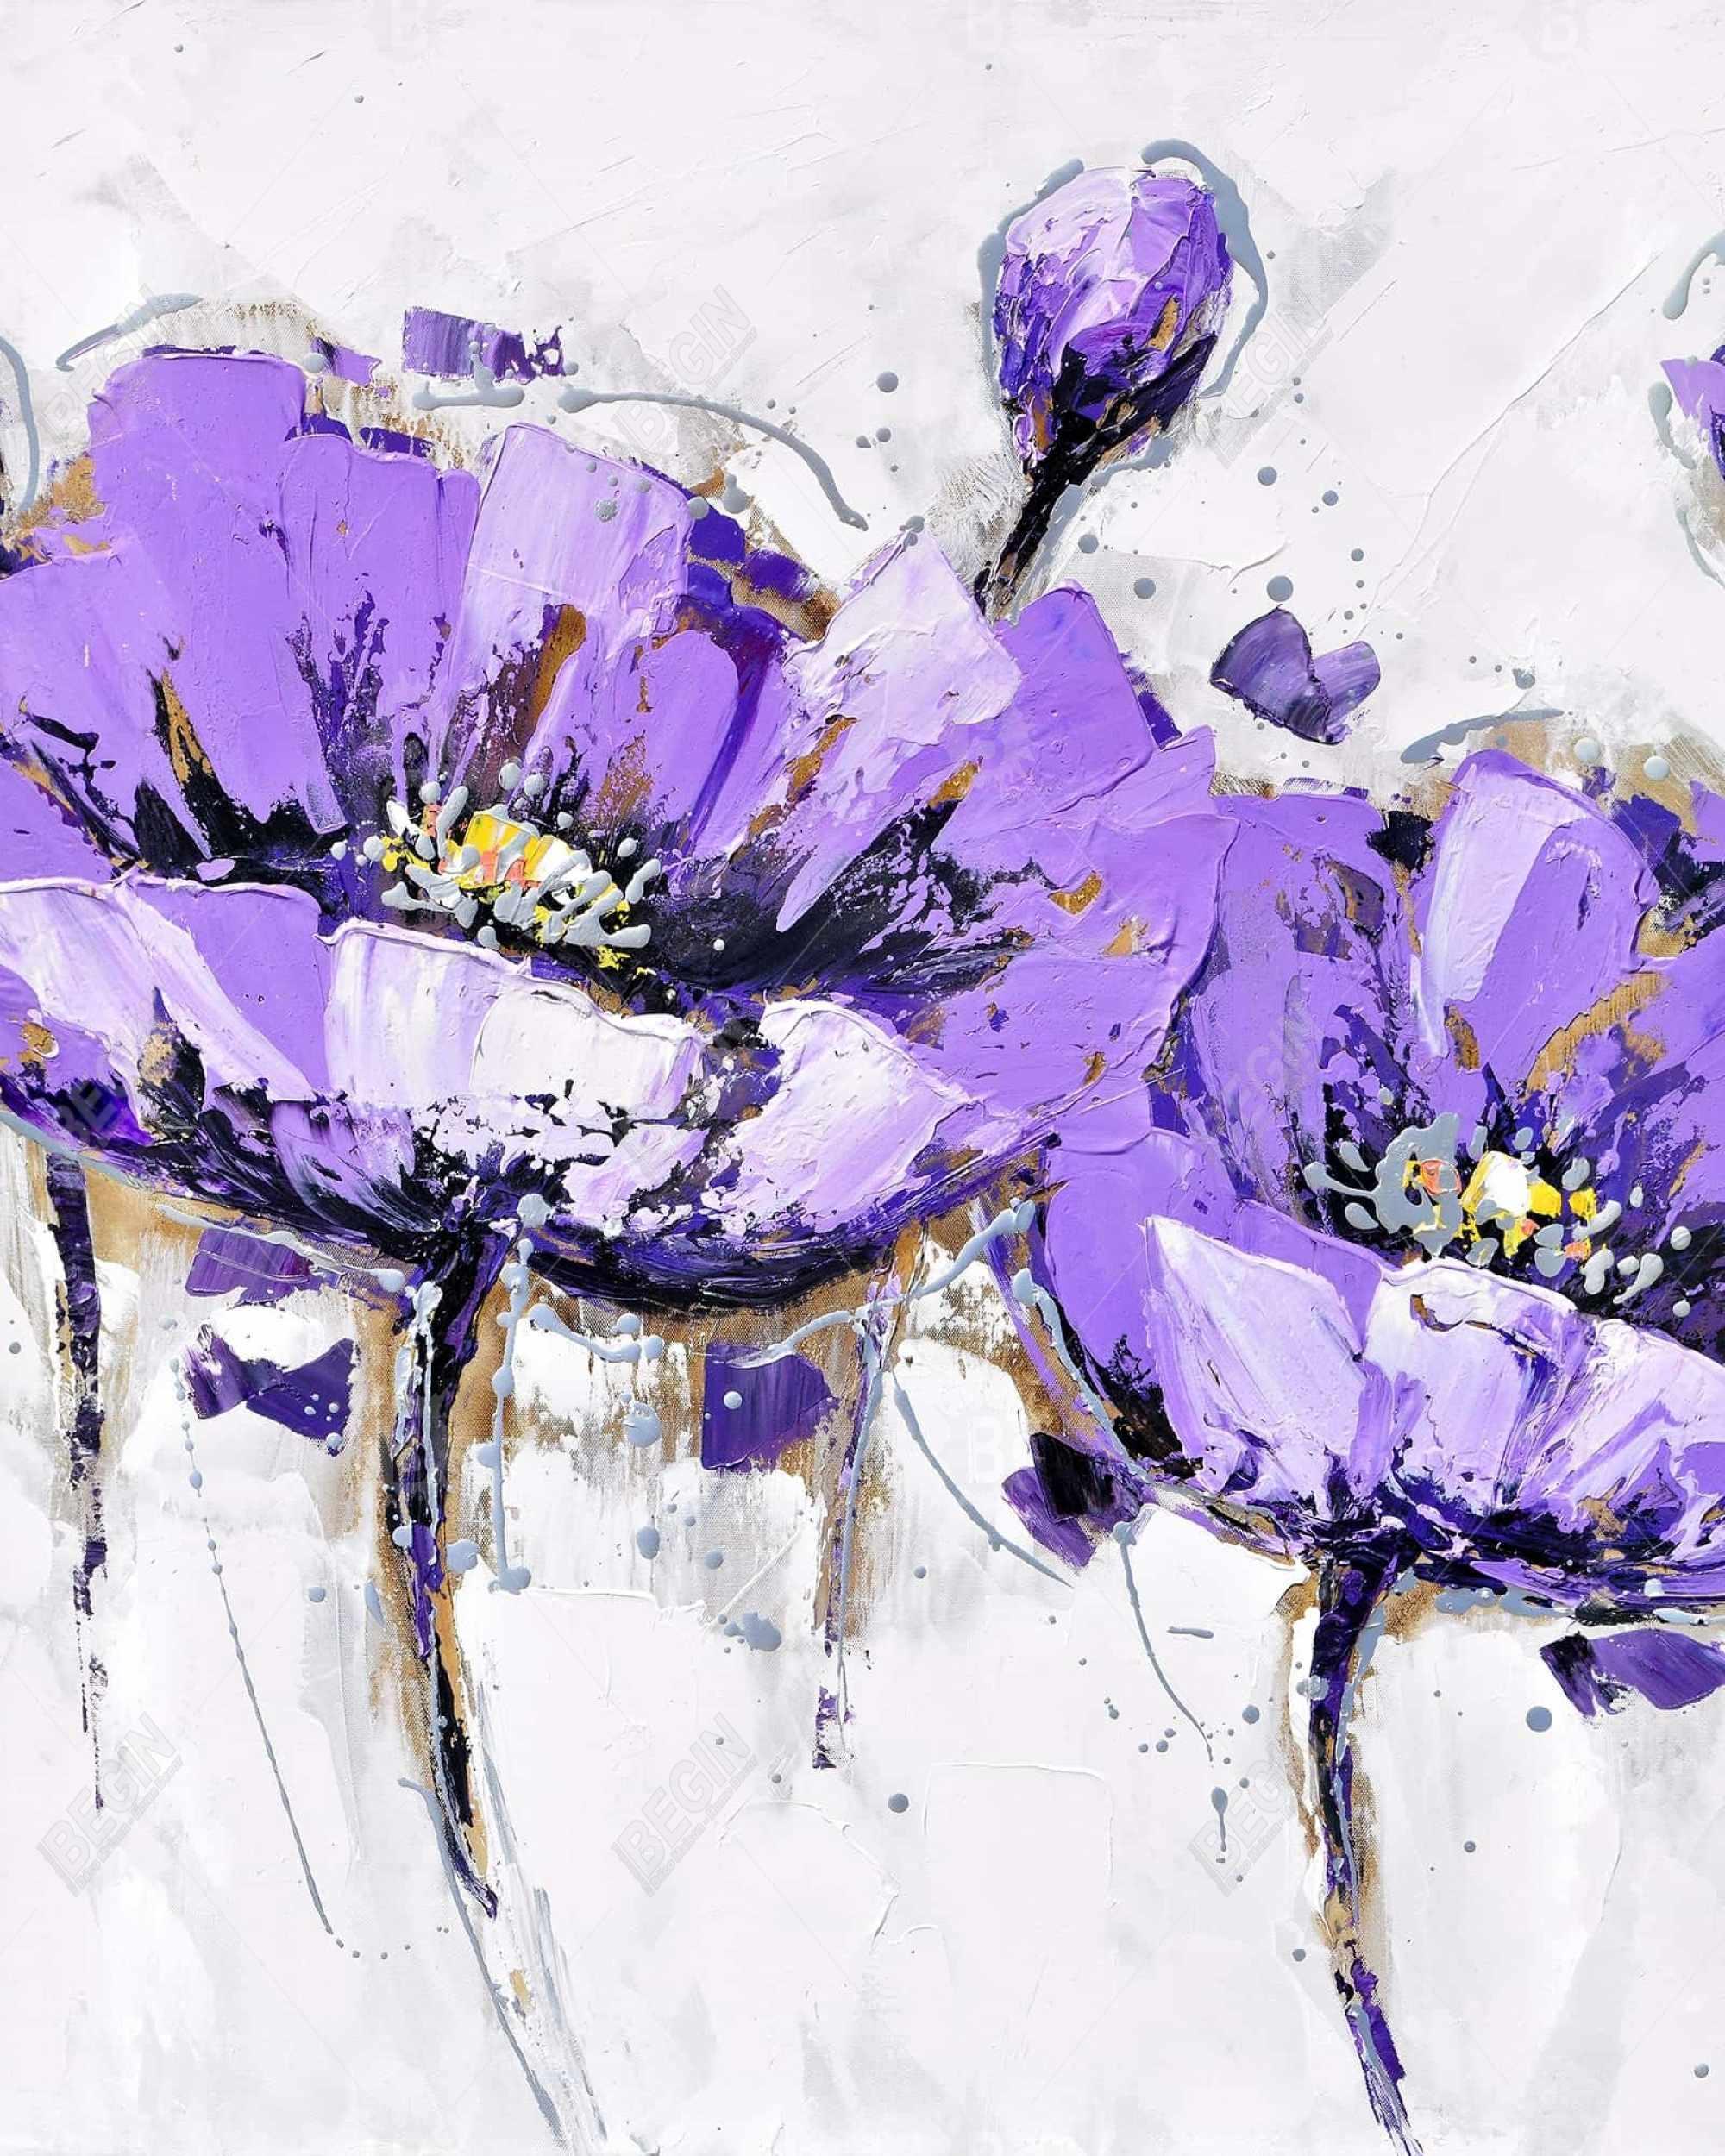 Purple anemone flowers